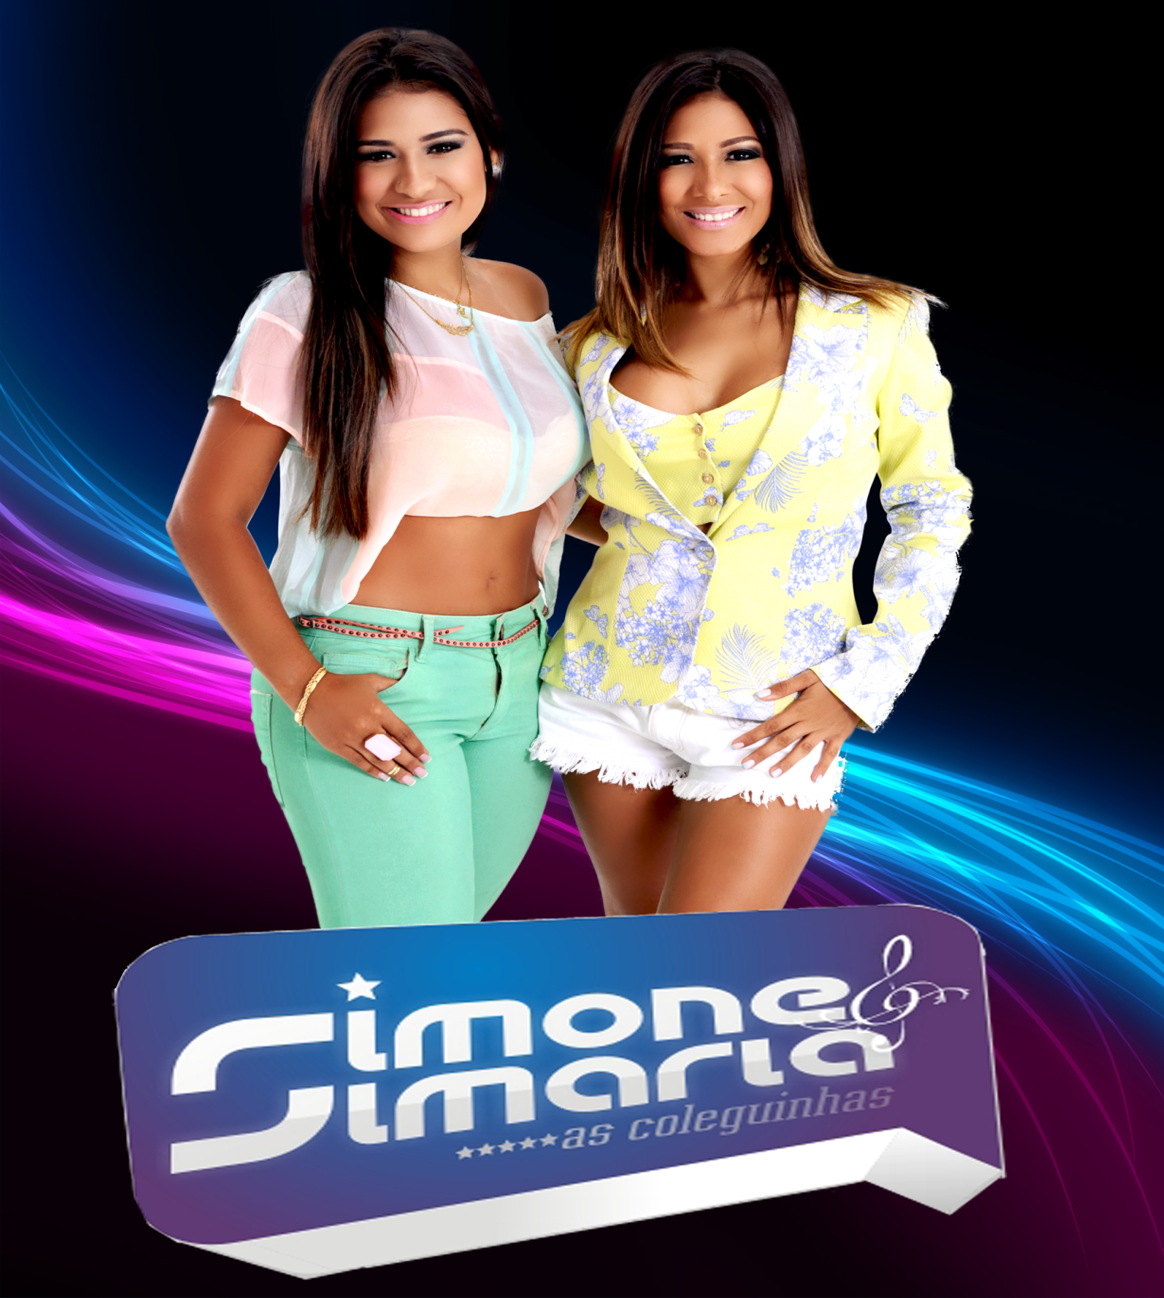 Simone e Simaria - Faroeste - Fortaleza - CE - 2013